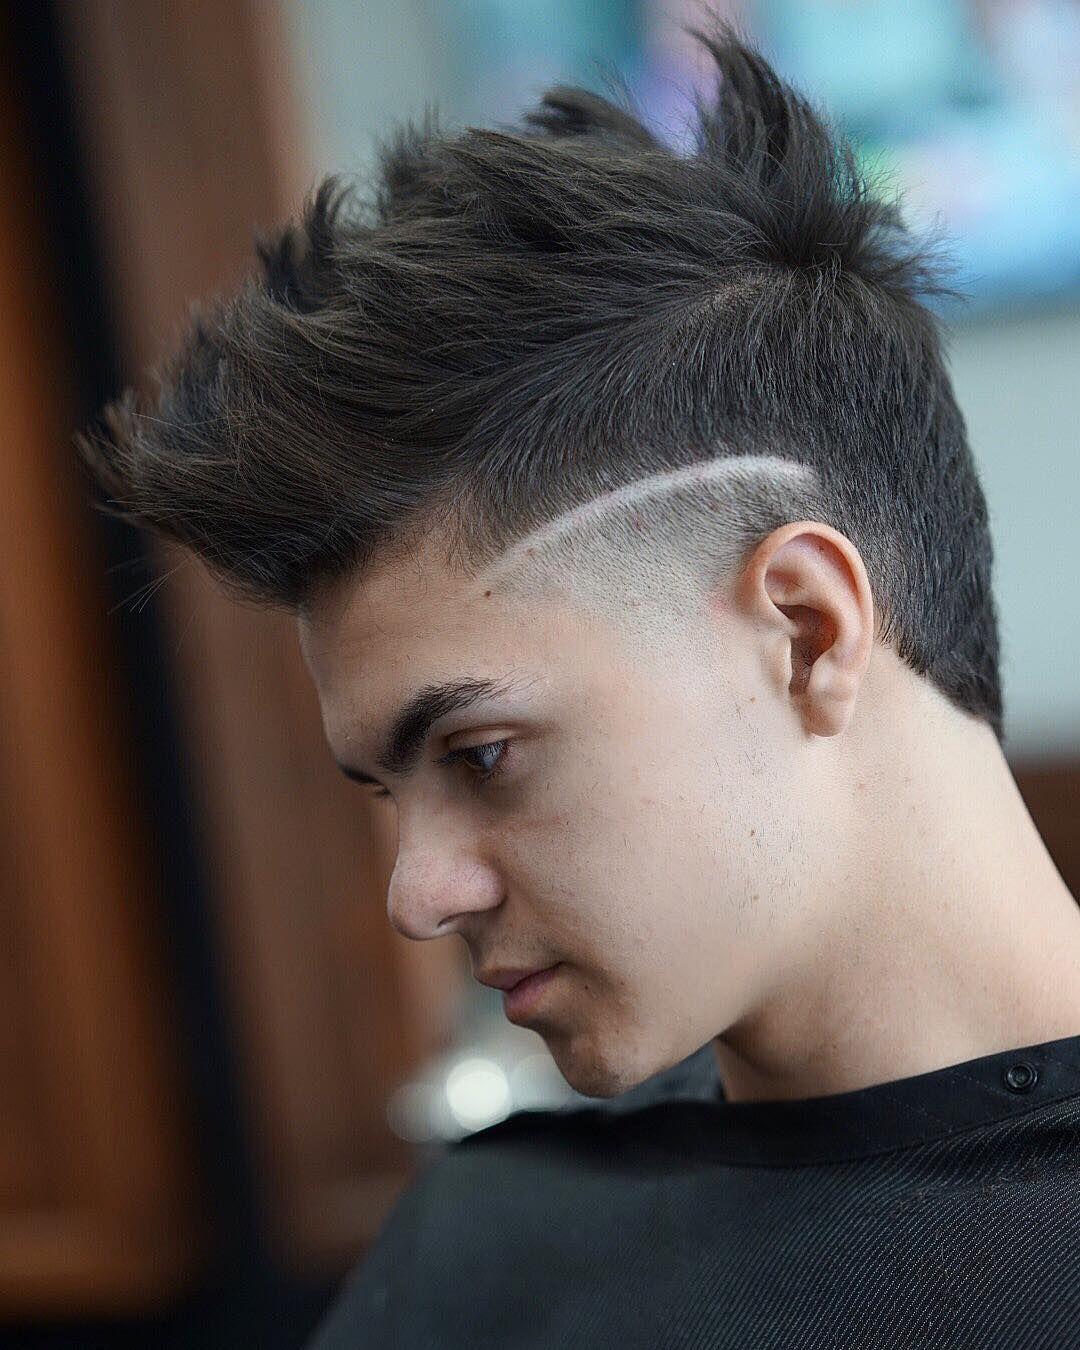 V style haircut men  simple regular clean cut haircuts for men  hair and beauty